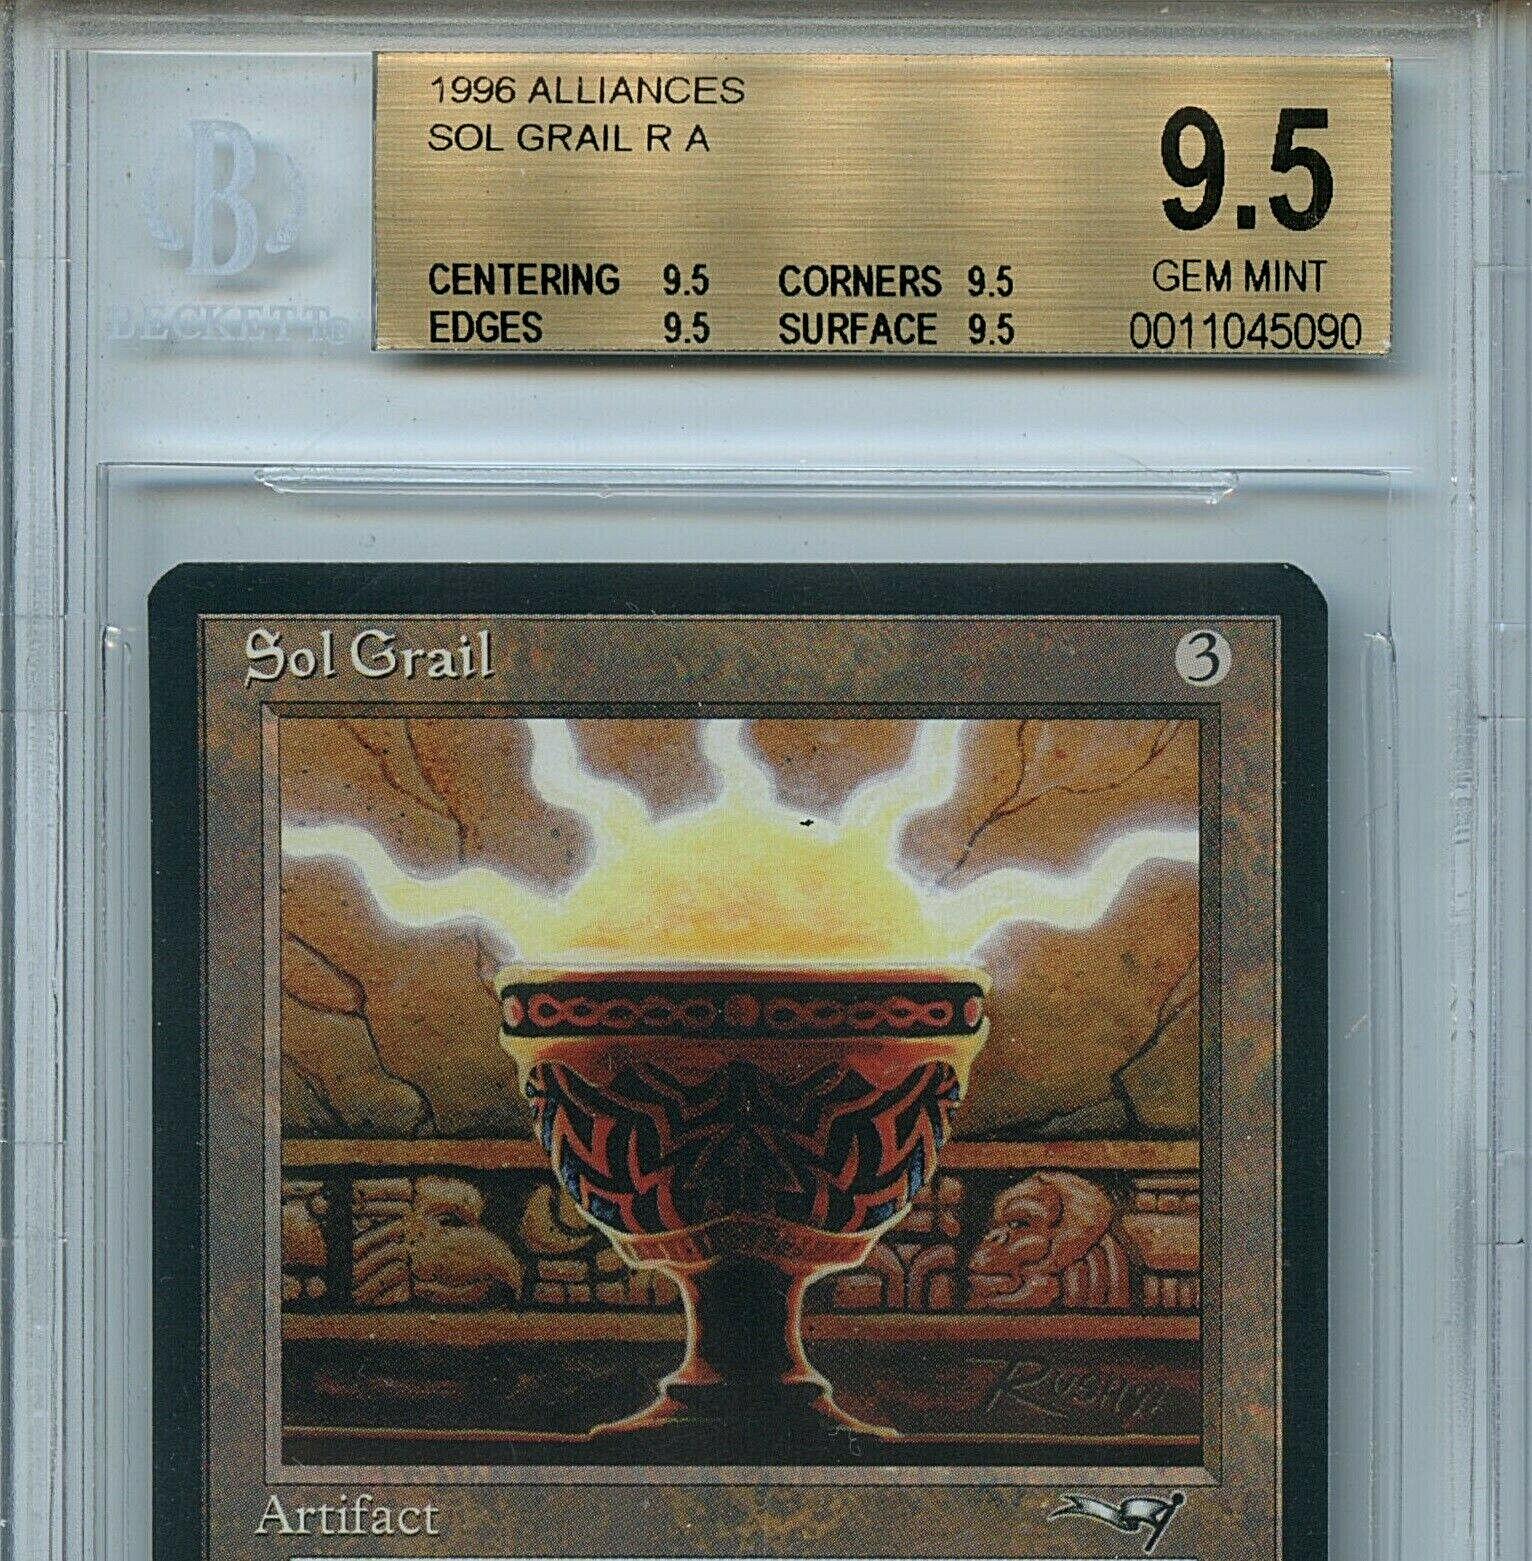 MTG Sol Grail BGS 9.5 Gem Mint Alliances Magic Card Card Card Amricons True Quad 5090 7fb5e2